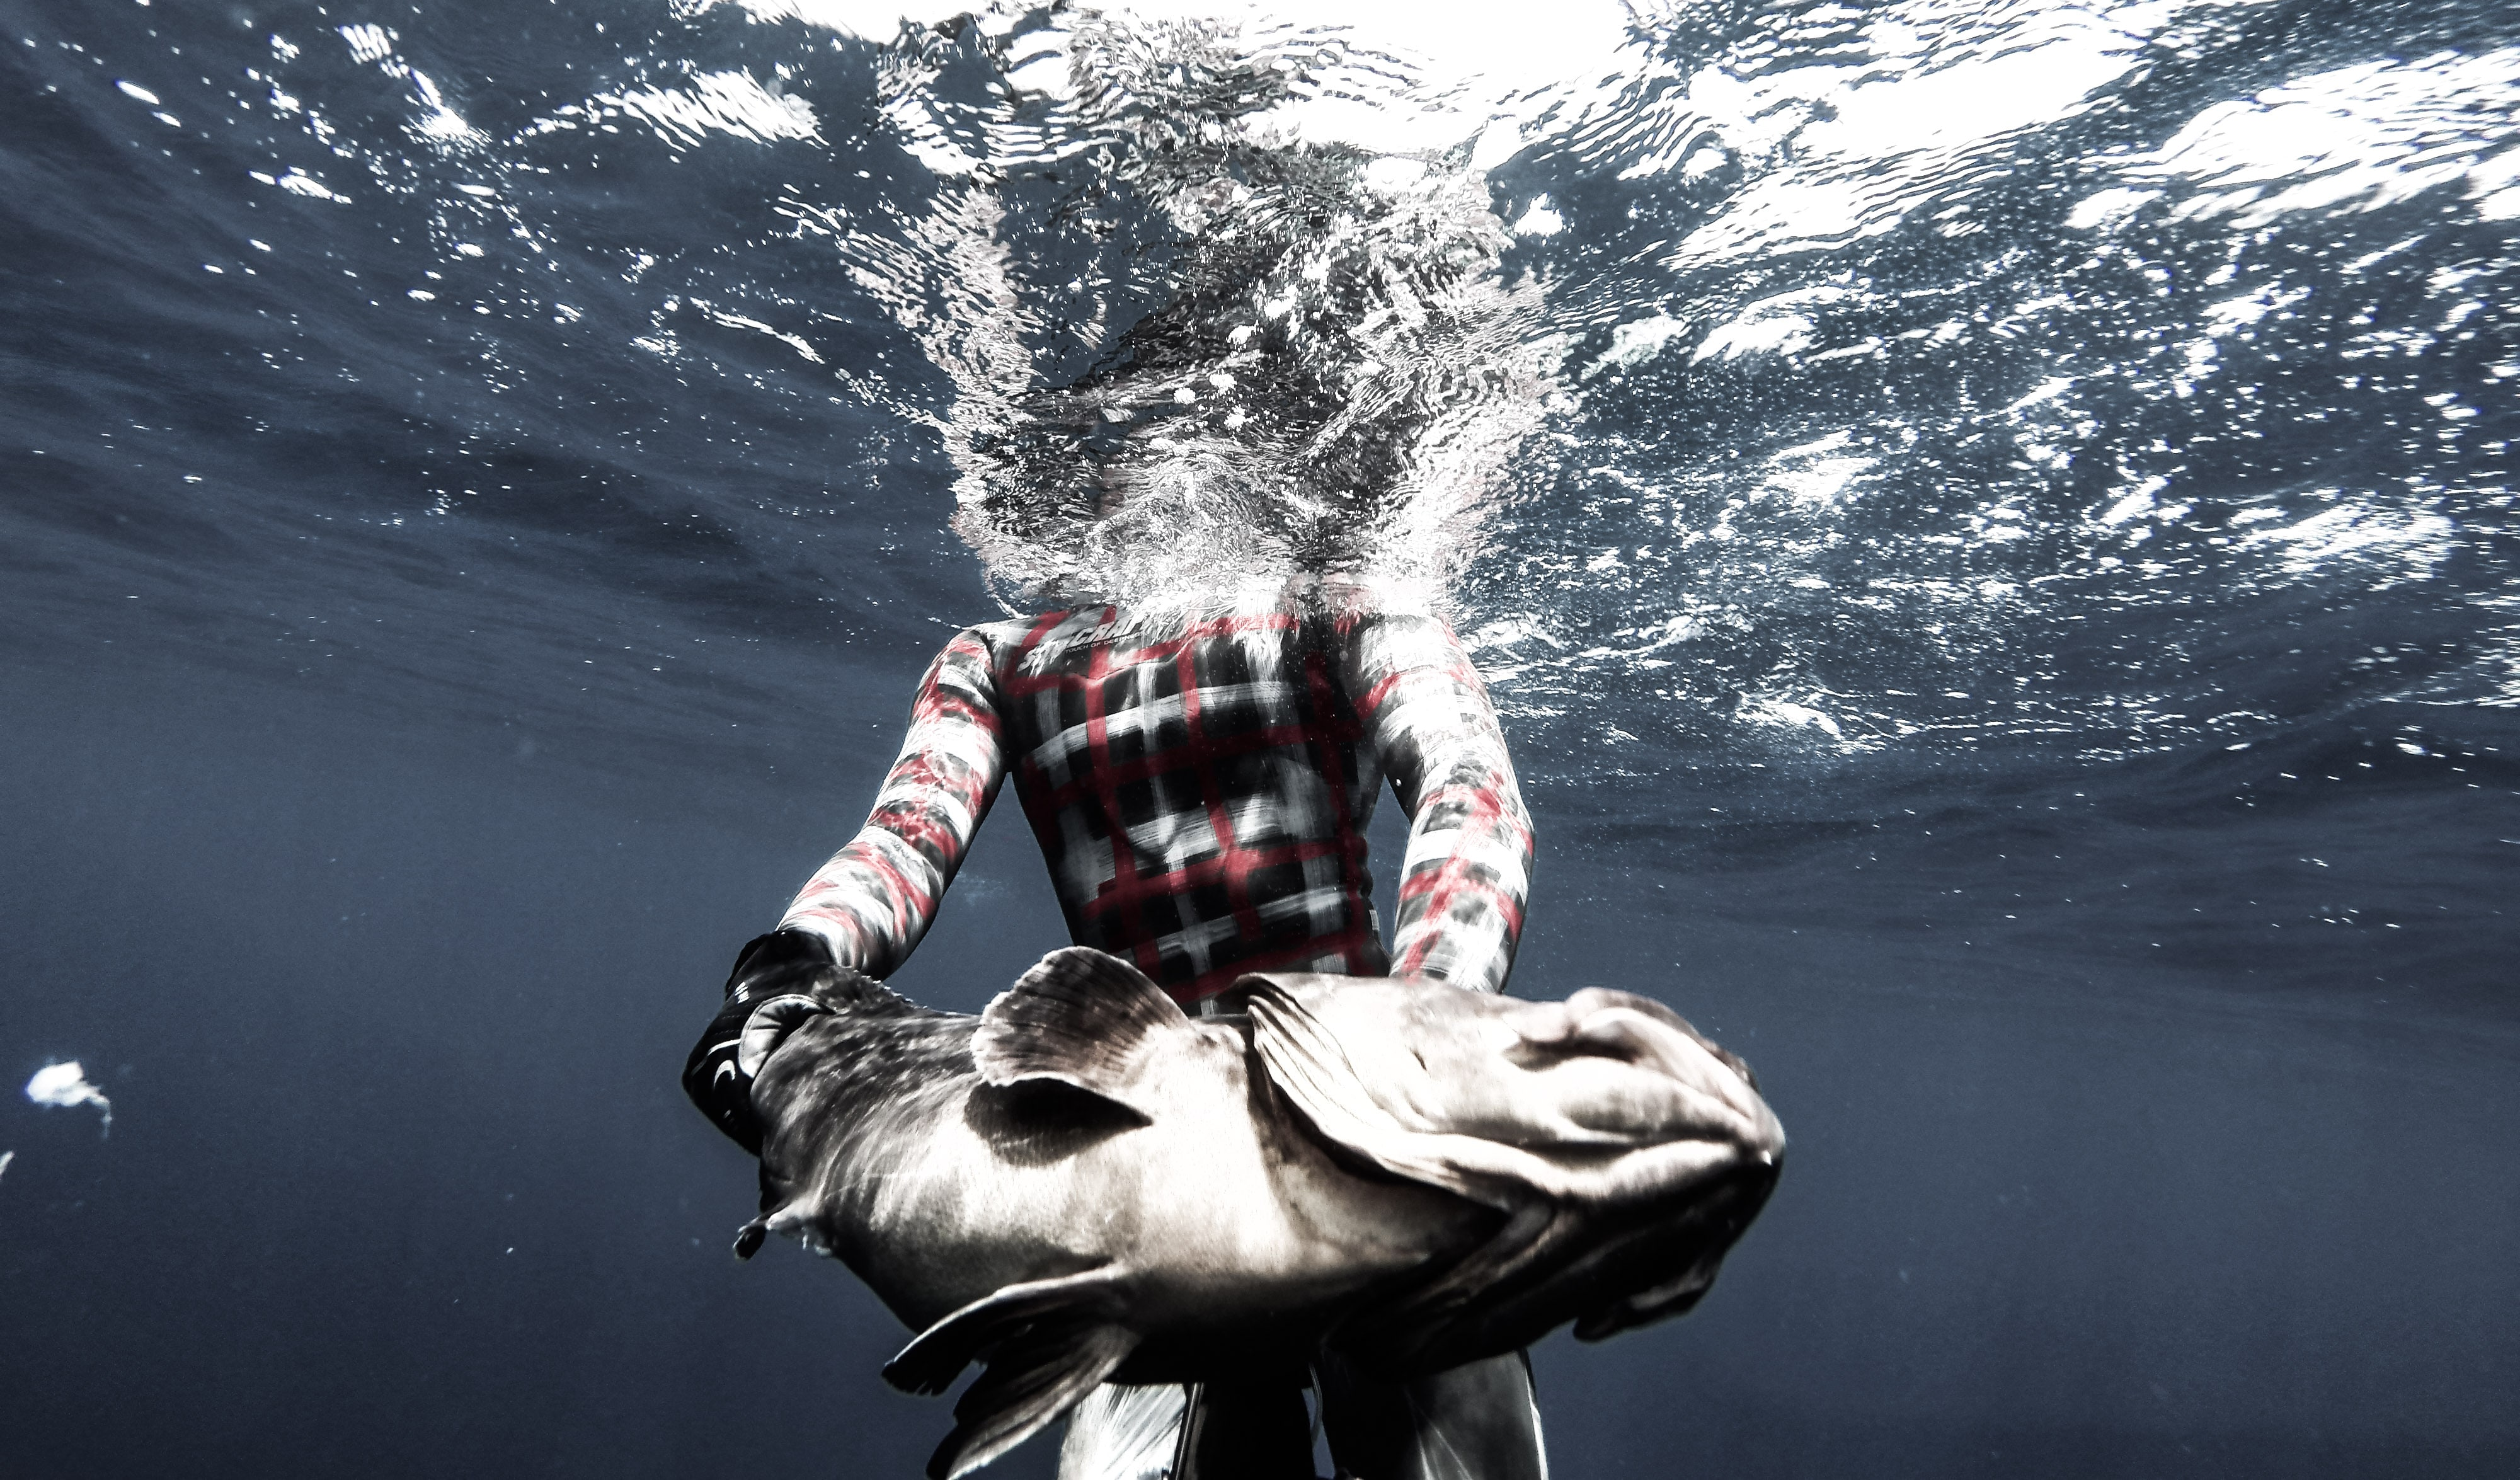 Deep Spearfishing Encyclopedia: Agguato 1